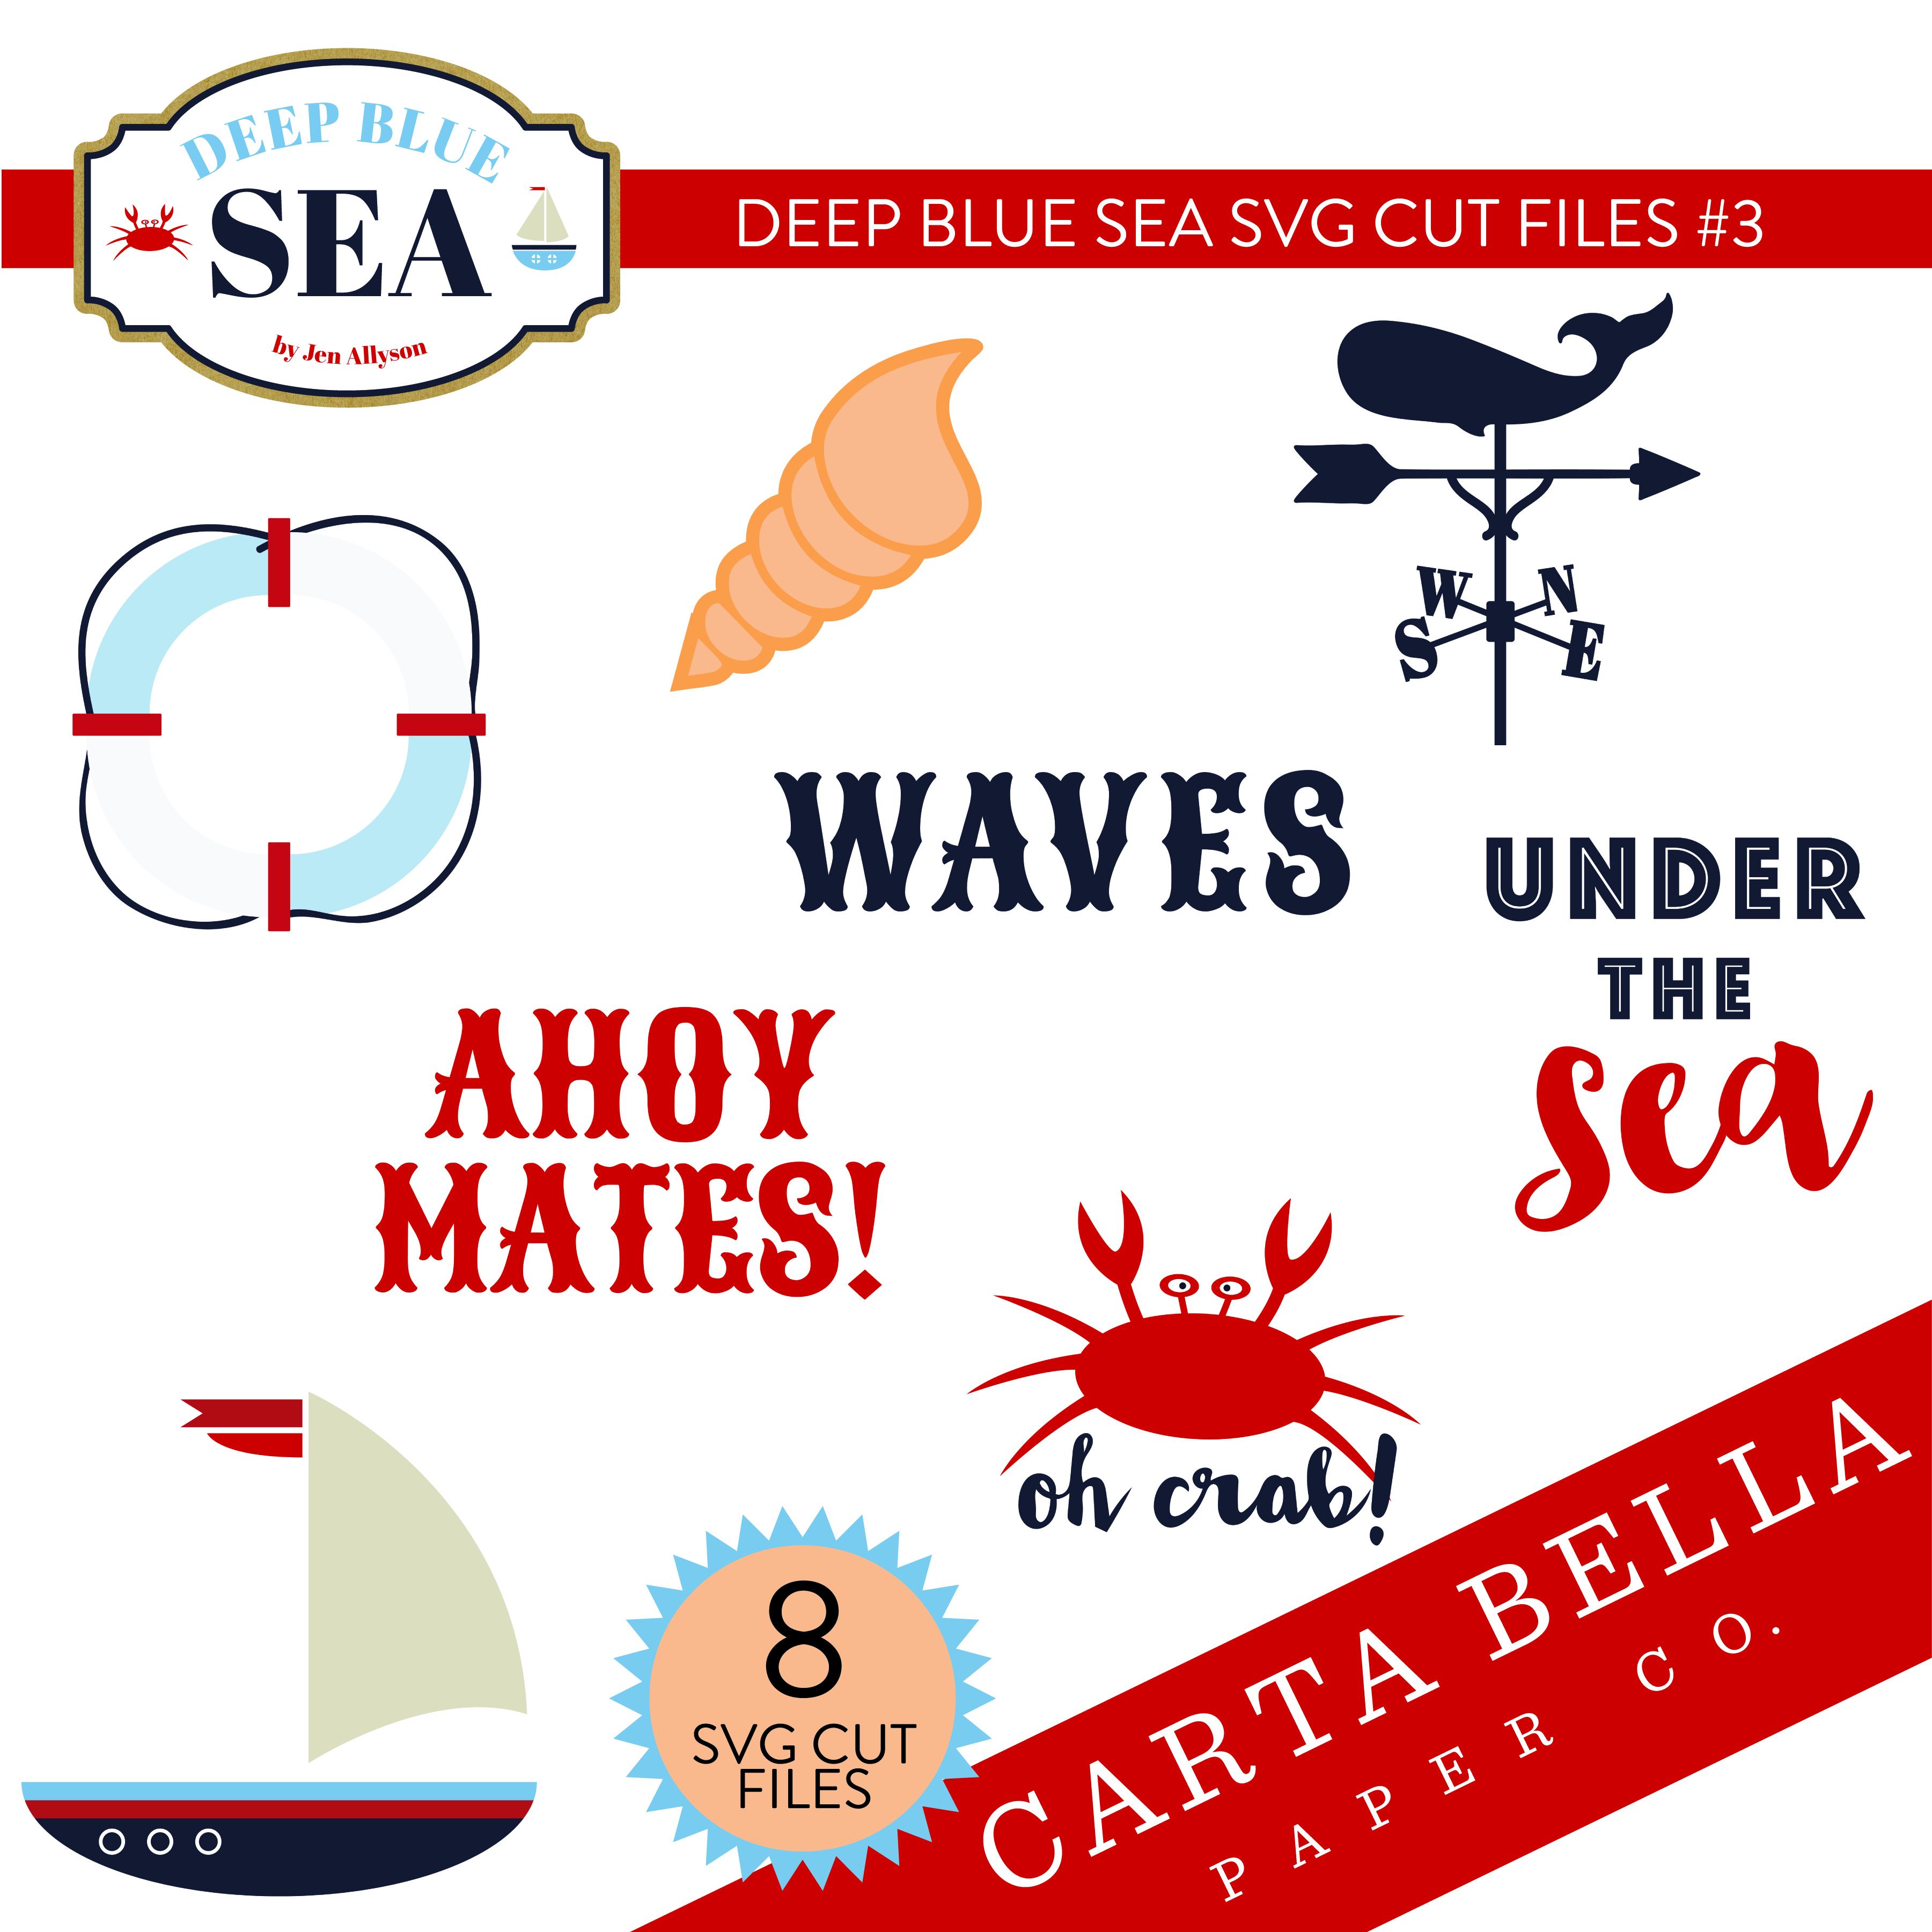 Deep Blue Sea SVG Cut Files #3